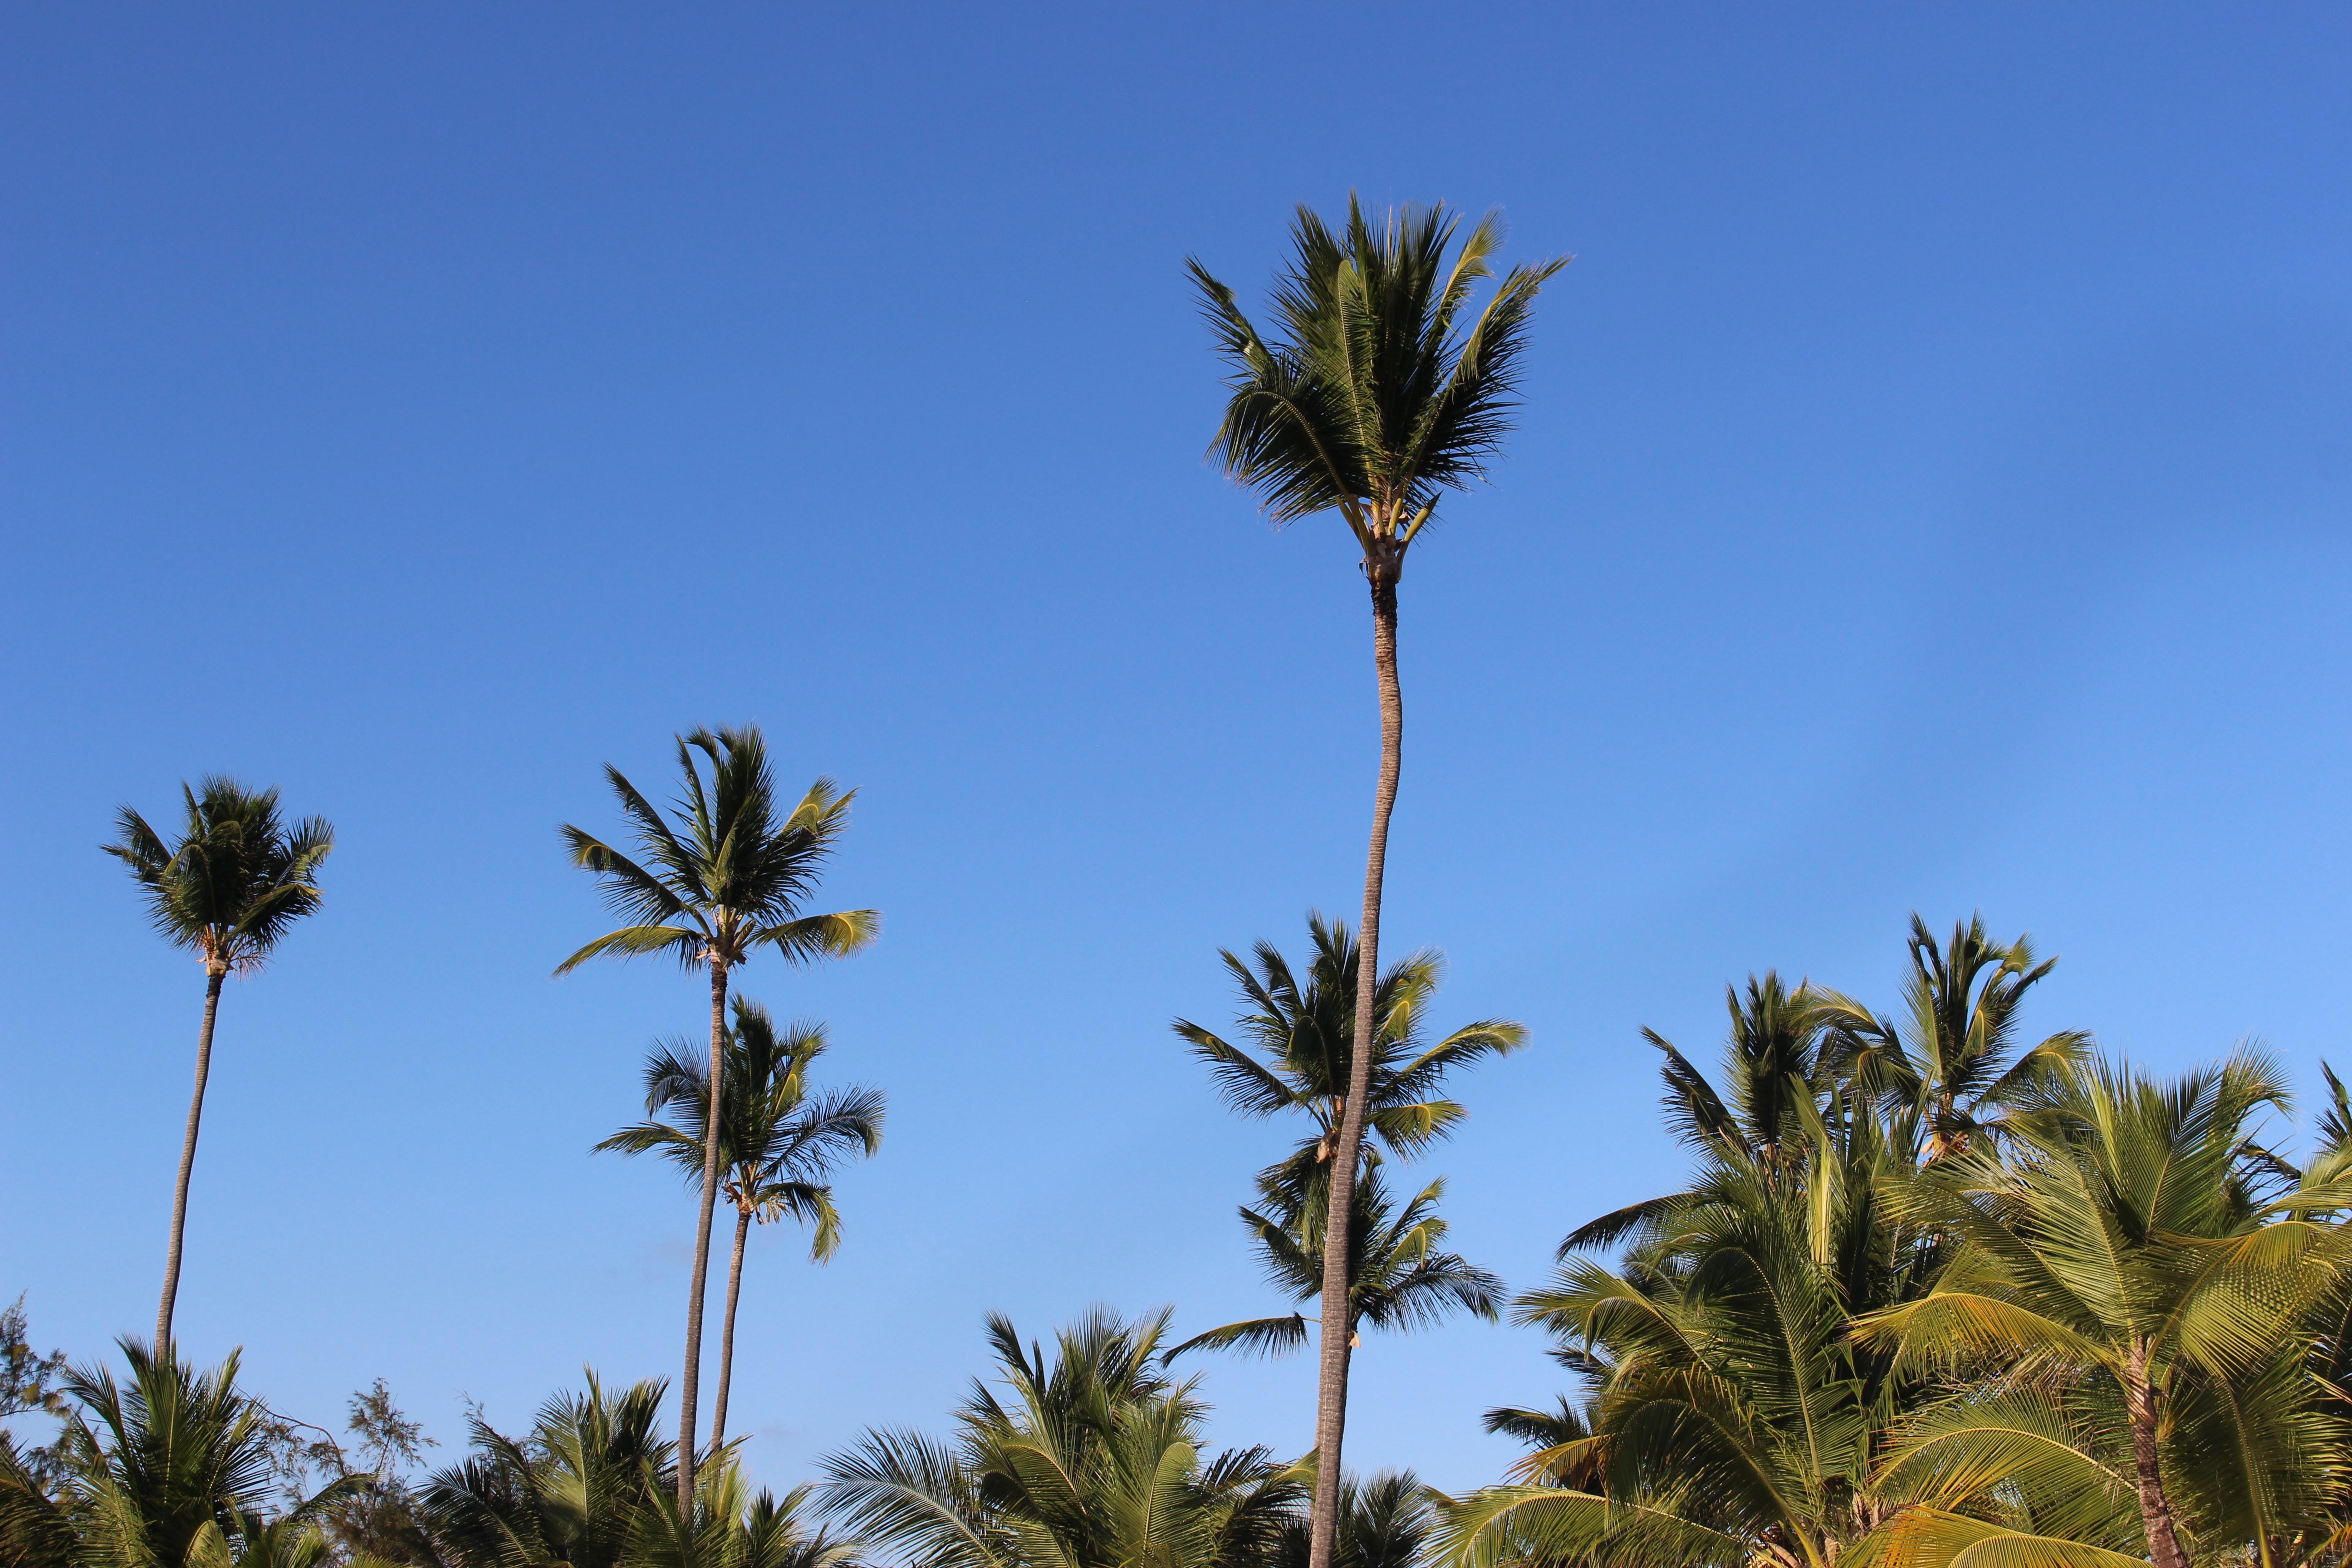 Photo of palm trees swaying against a clear blue sky. Image courtesy of Kapil Sharma via Unsplash.